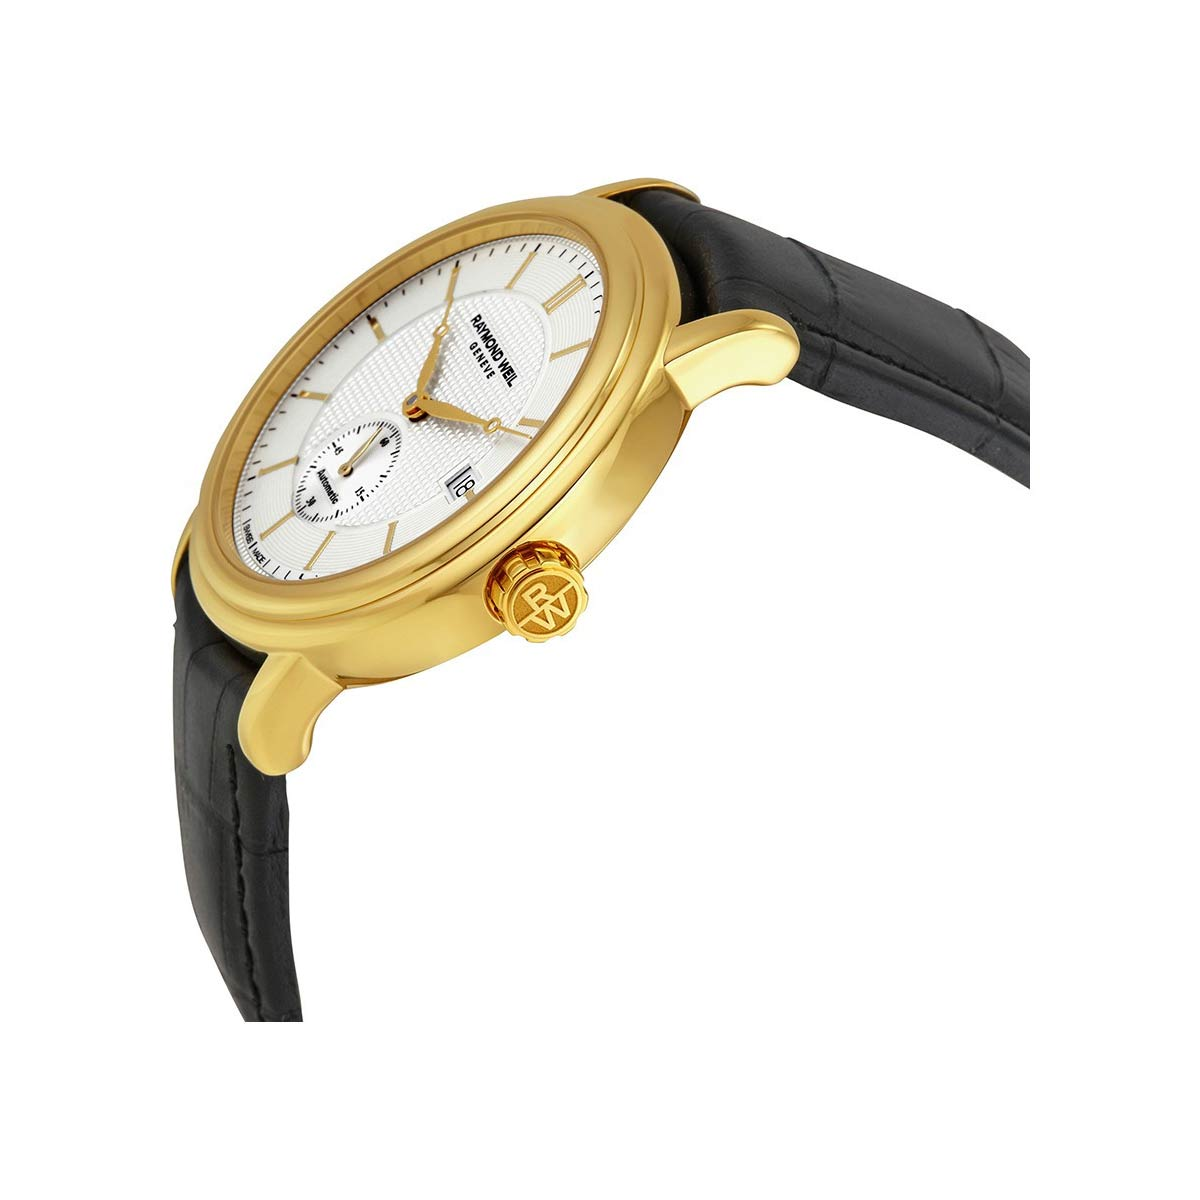 Часовник Raymond Weil 2838-PC-65001